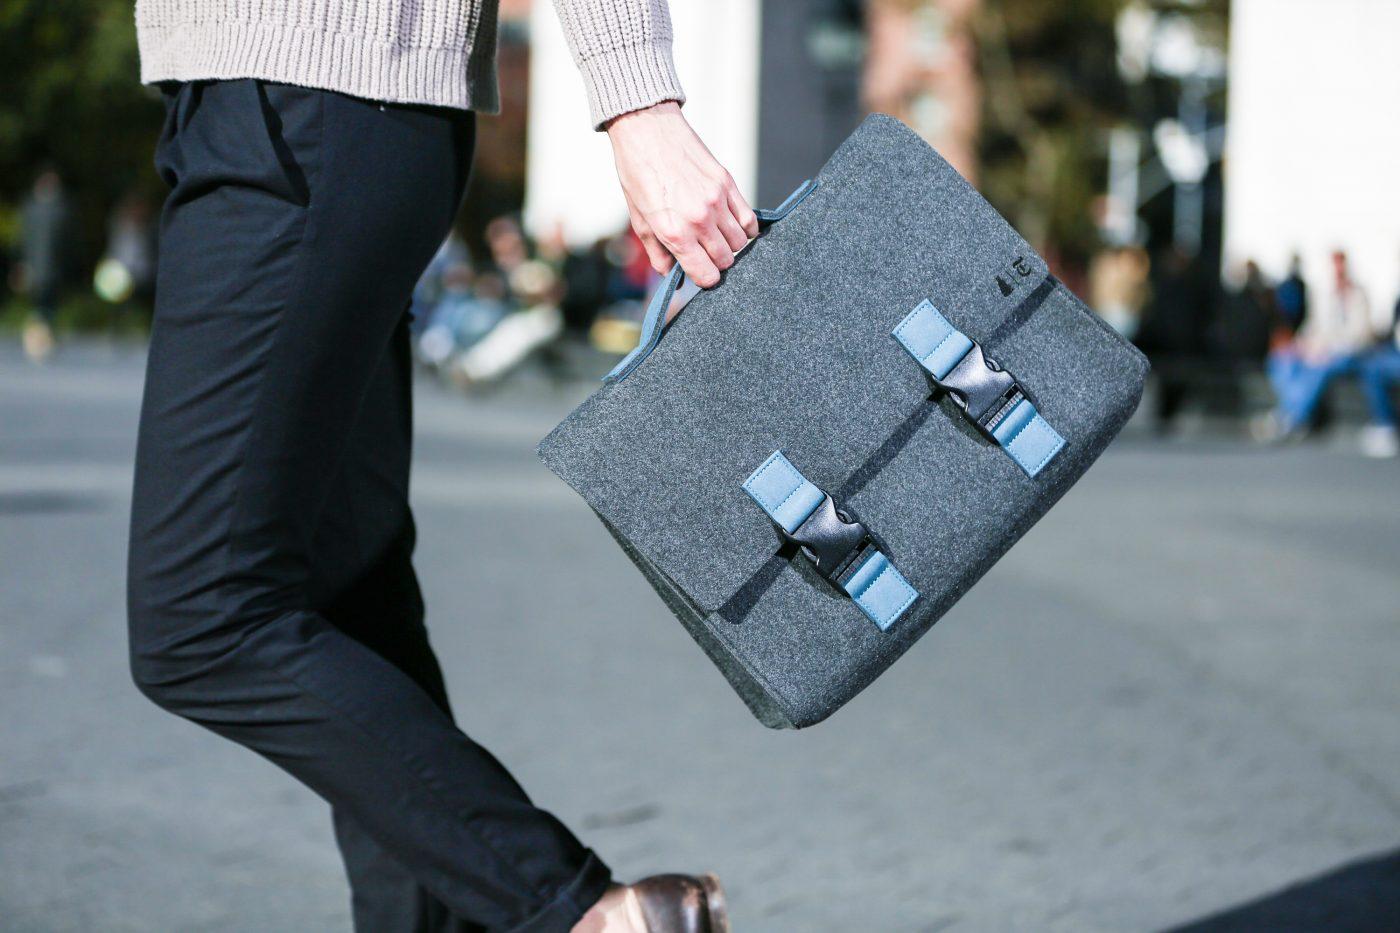 534441n_greenwich-briefcase_charcoalgrey-lakeblue_4